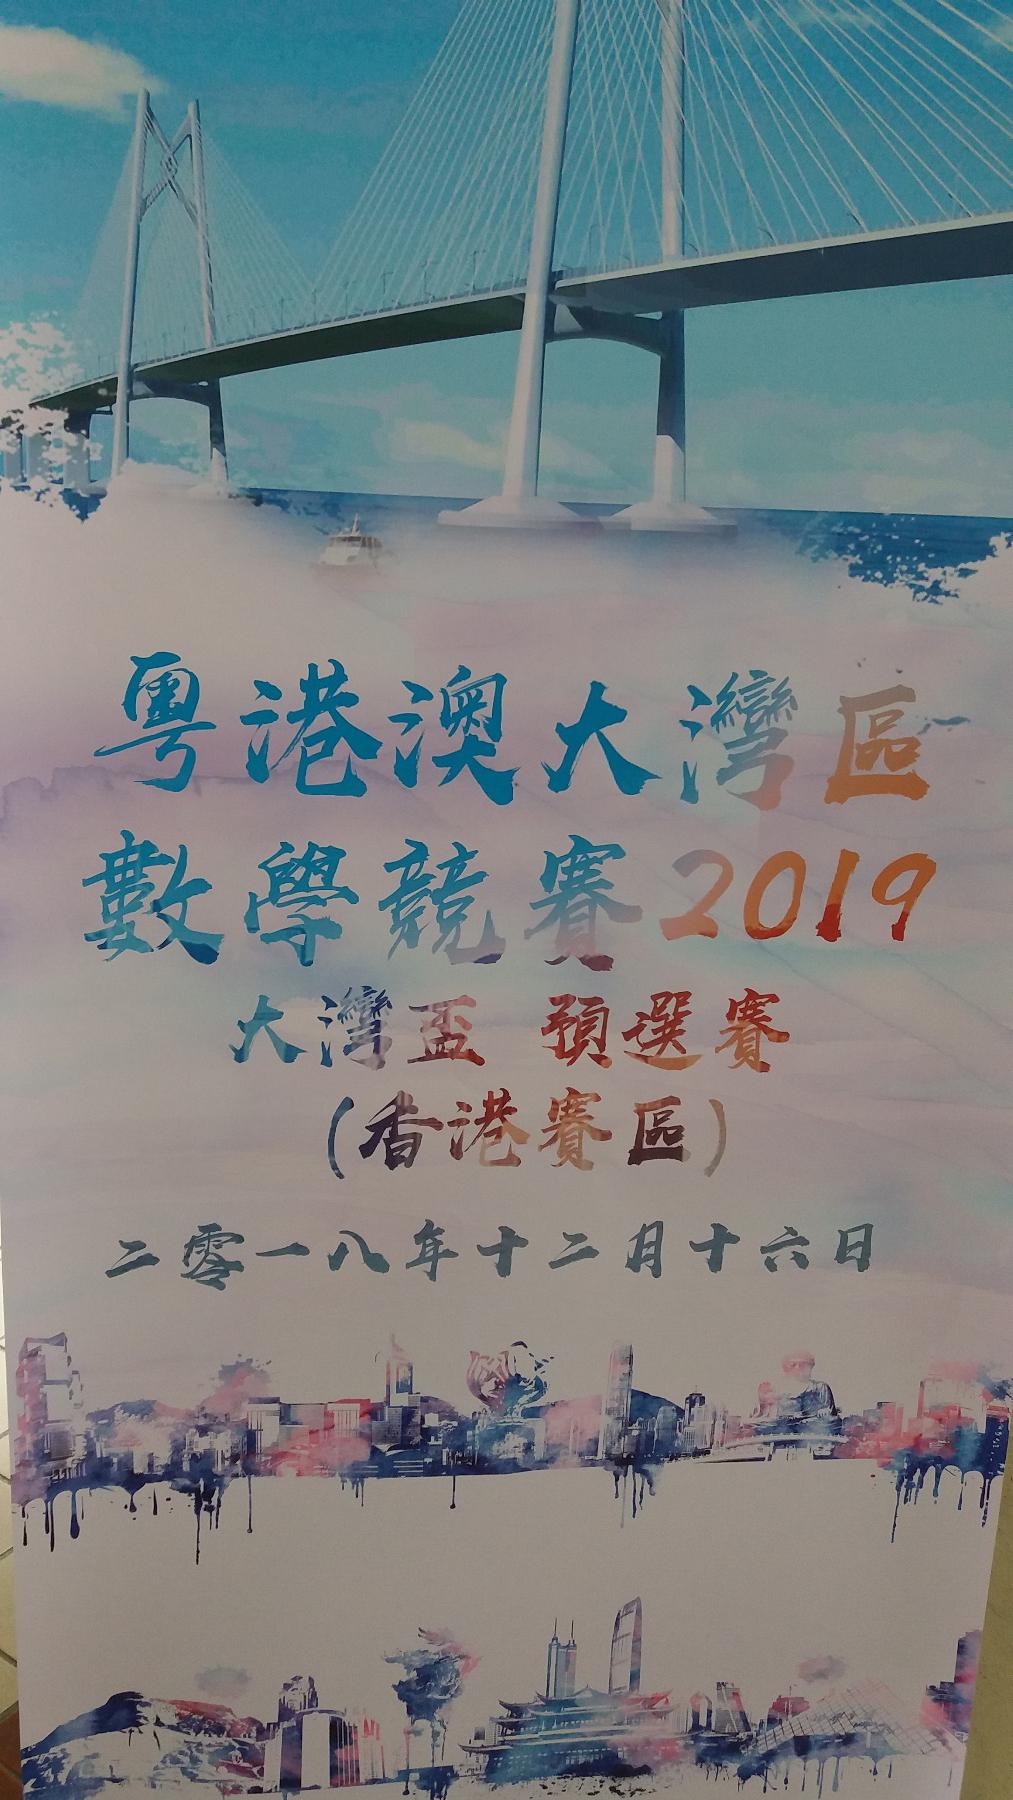 http://npc.edu.hk/sites/default/files/20181216_0.jpg